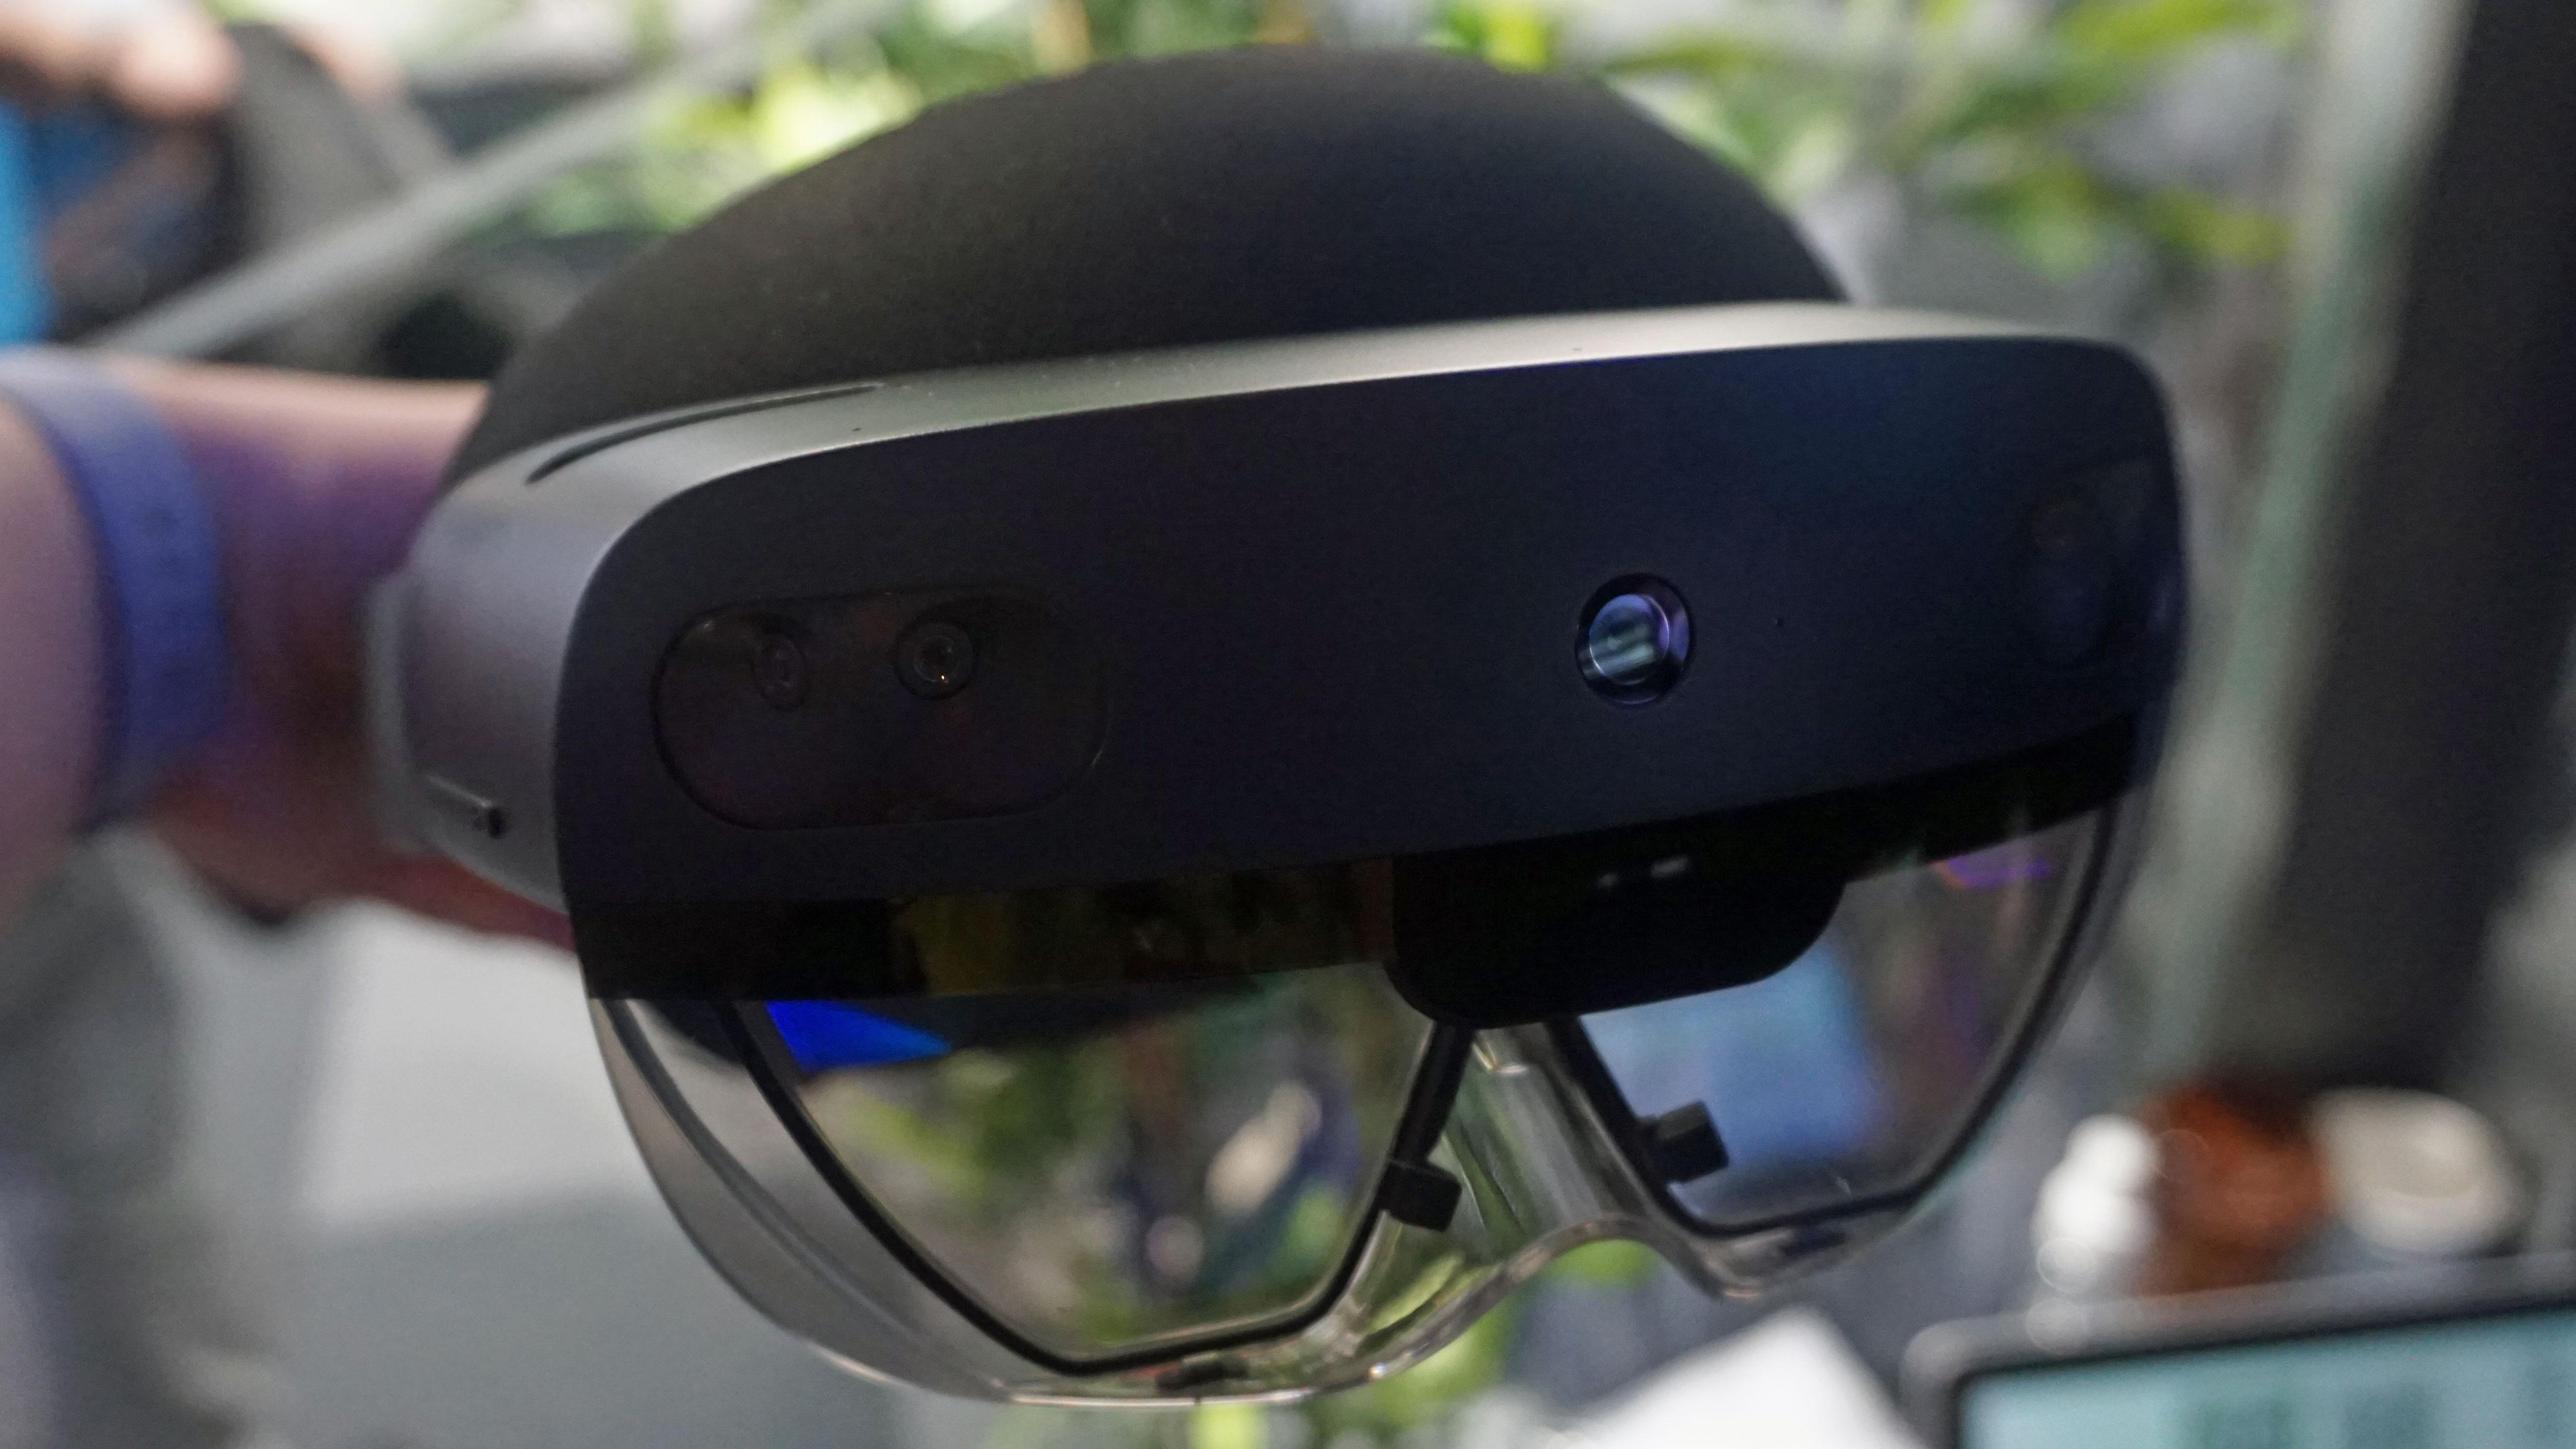 Microsoft HoloLens. Image Credit: TechRadar.